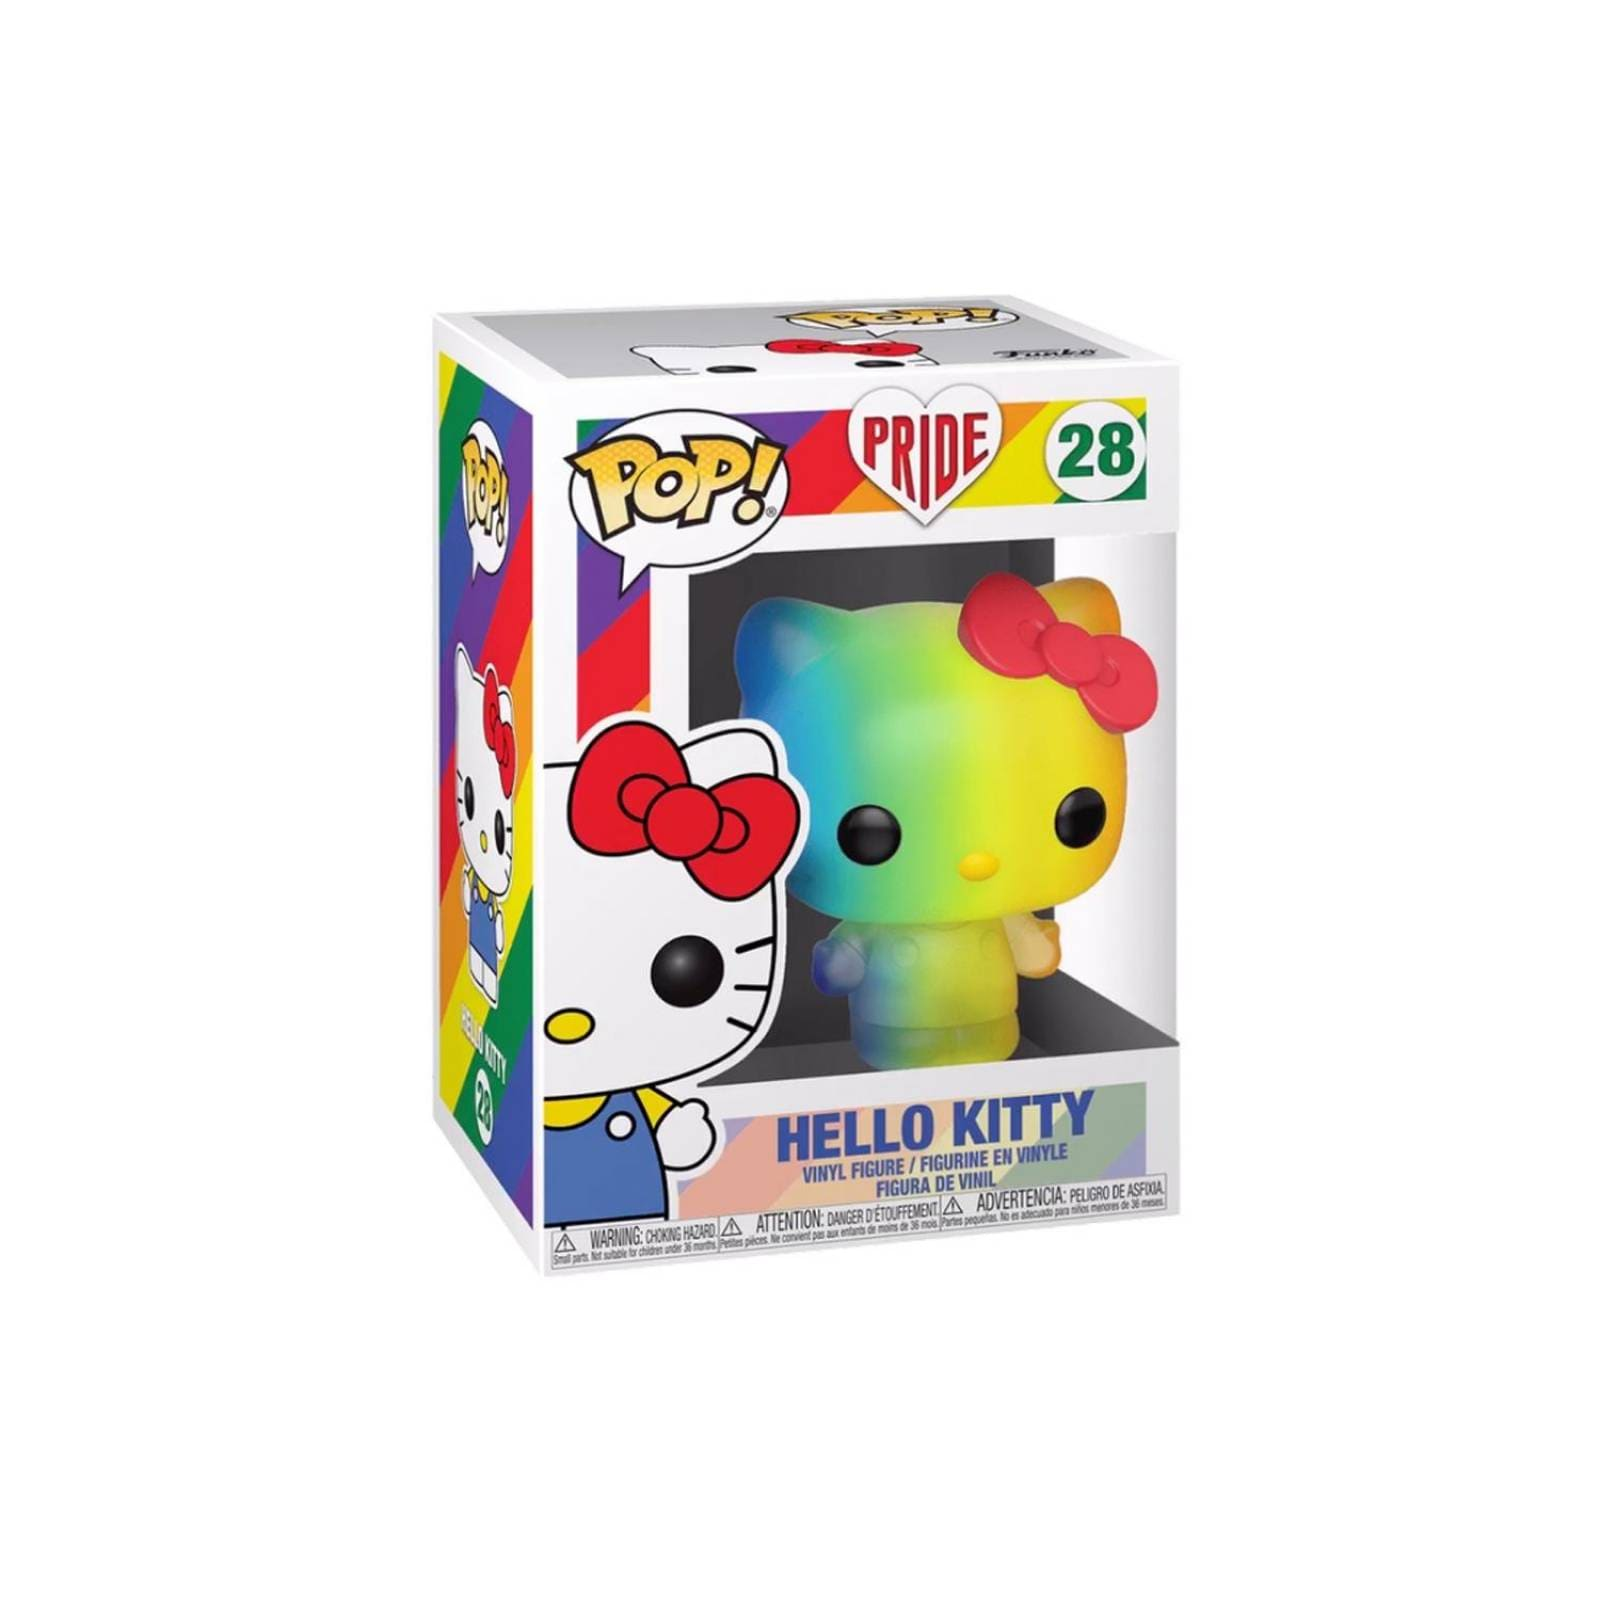 Hello Kitty Rainbow Funko Pop Pride 2020